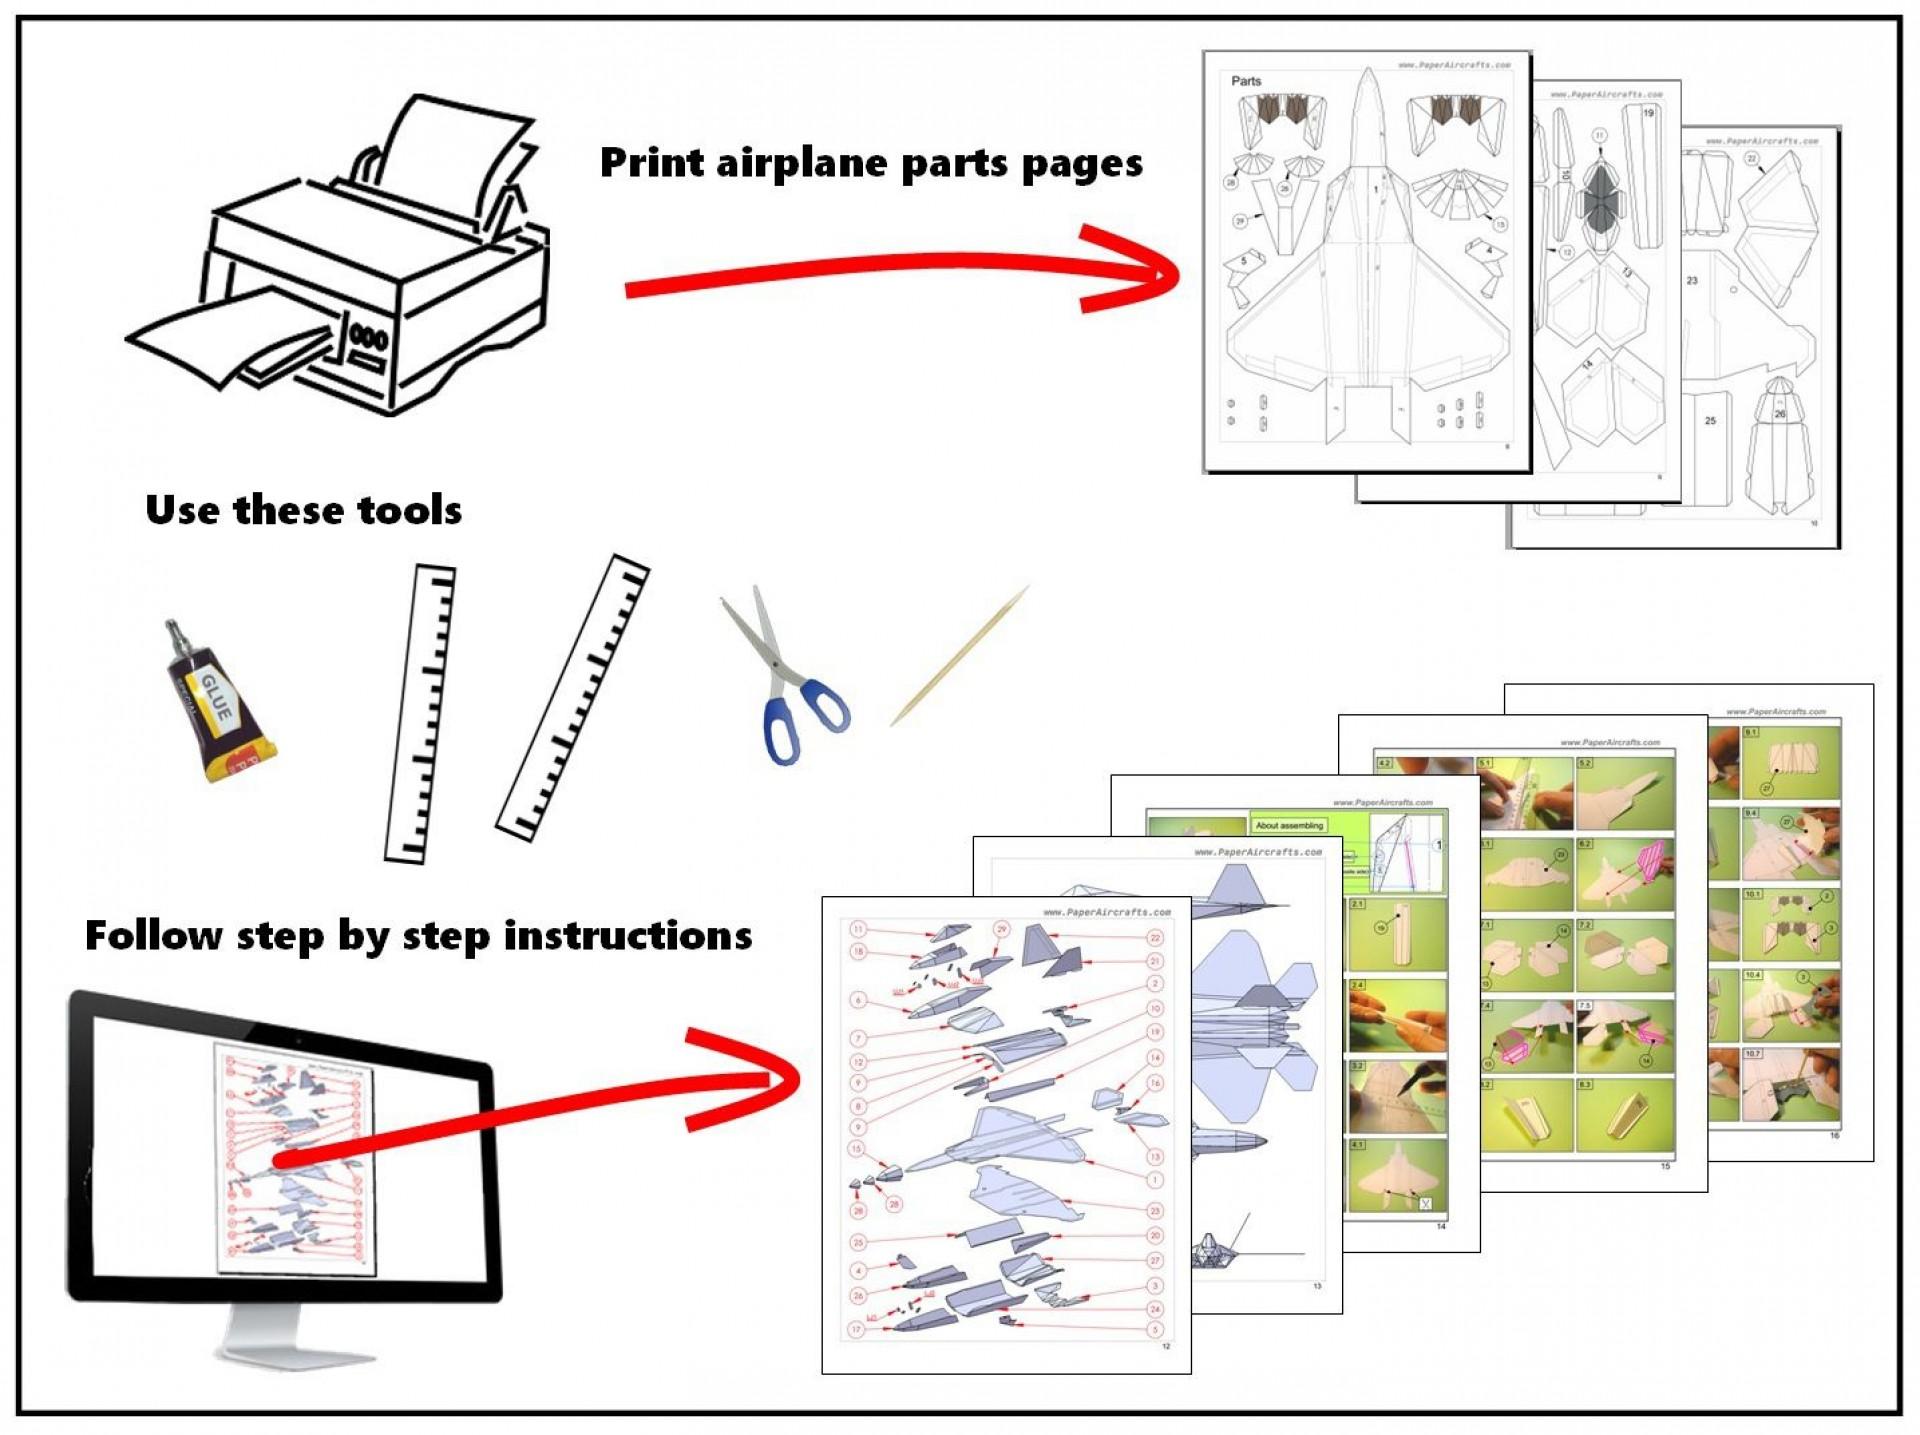 002 Wonderful Printable Paper Plane Plan Inspiration  Plans Airplane Free Design Instruction1920